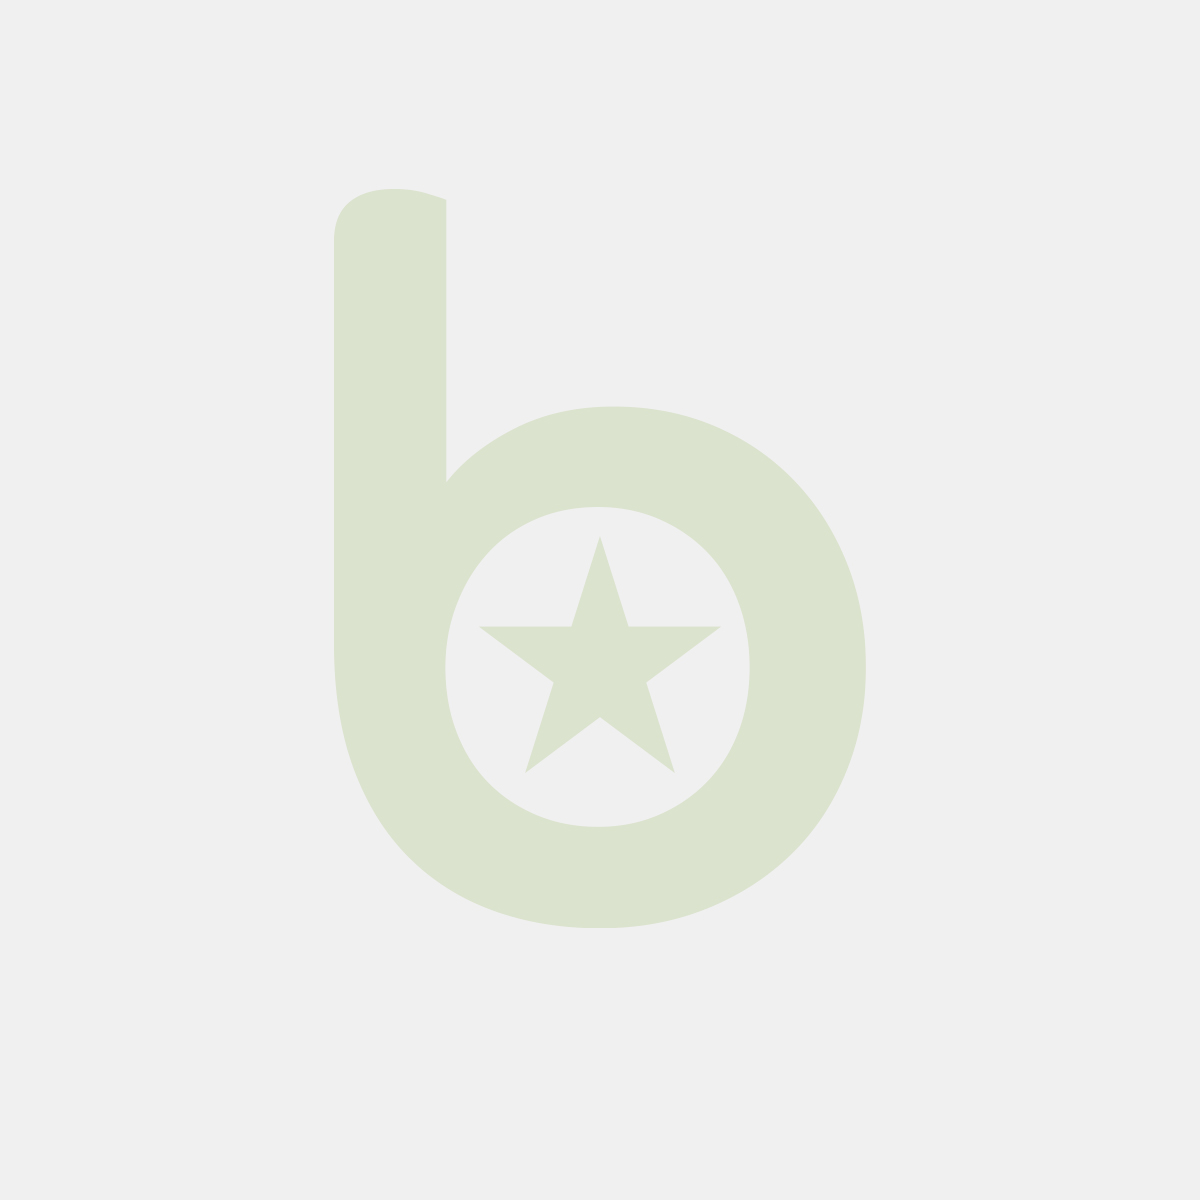 Bloczek samoprzylepny POST-IT® (655CY-VP20), 127x76mm, (16+4)x100 kart., żółte, 4 bloczki GRATIS